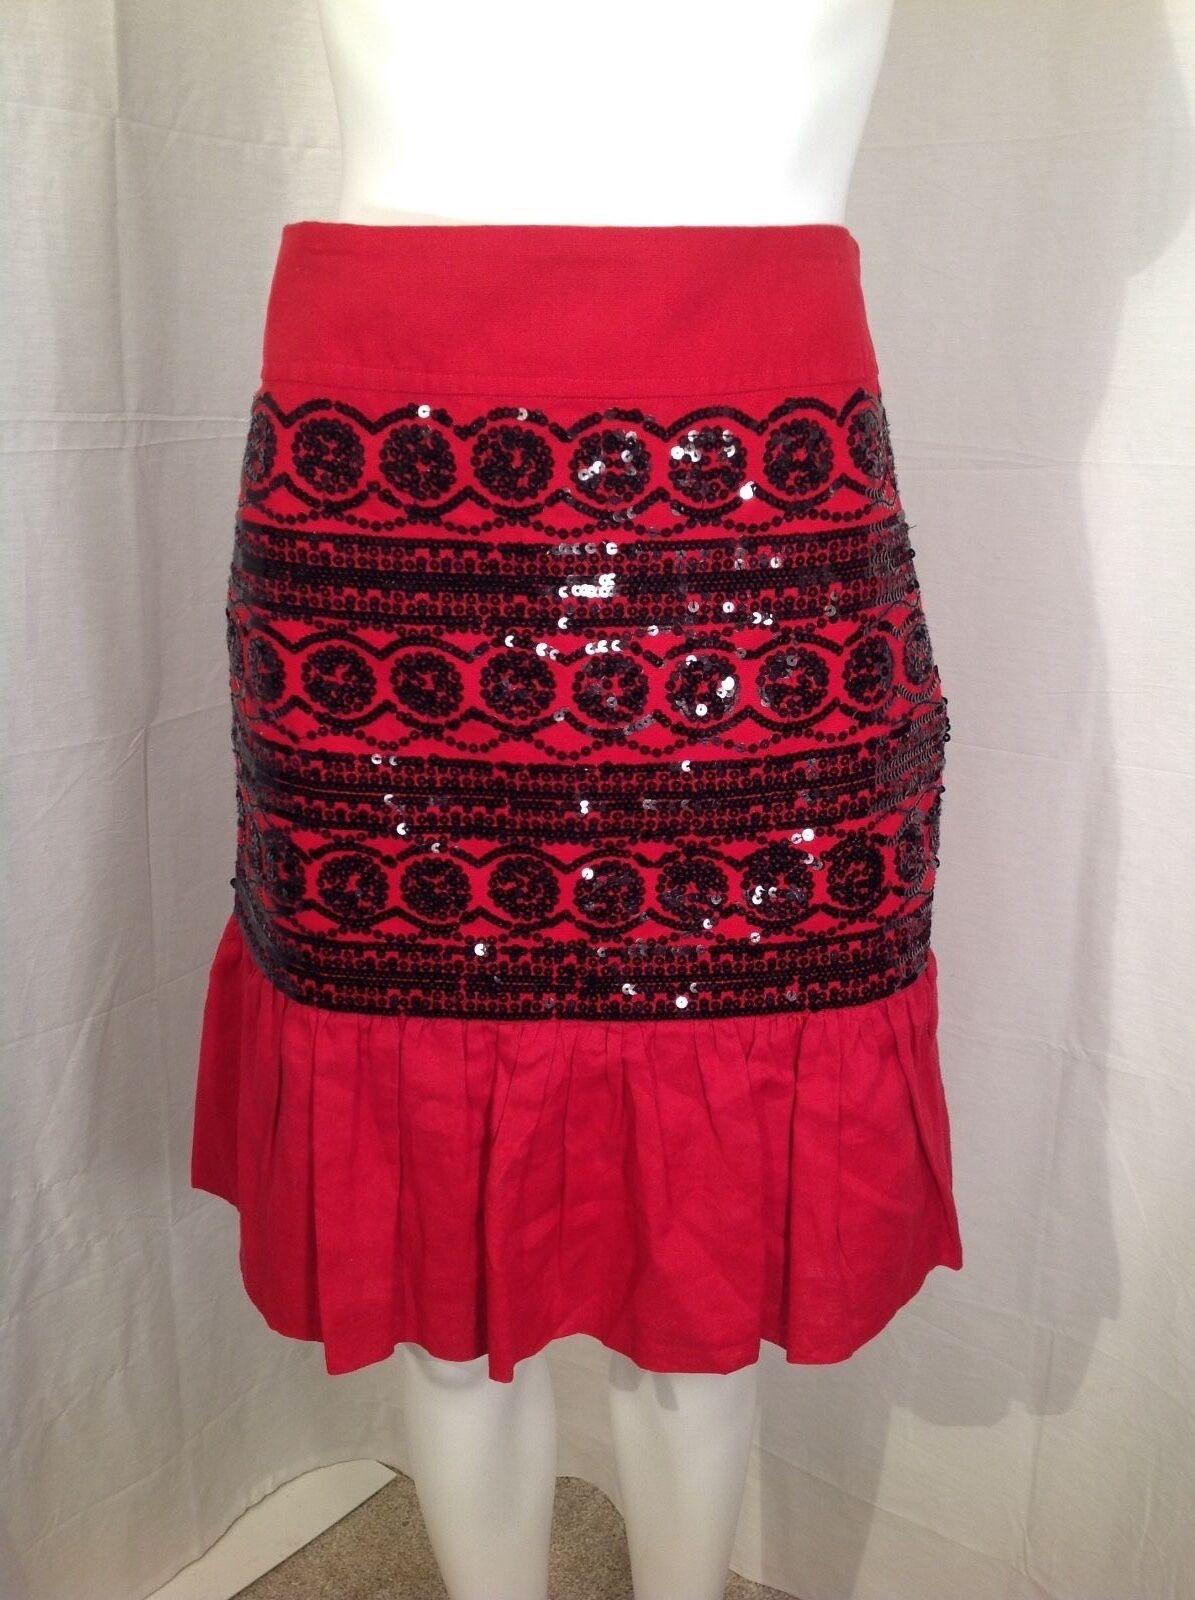 Anthropologie Moulinette Soeurs Red Sequin Skirt Sz 8